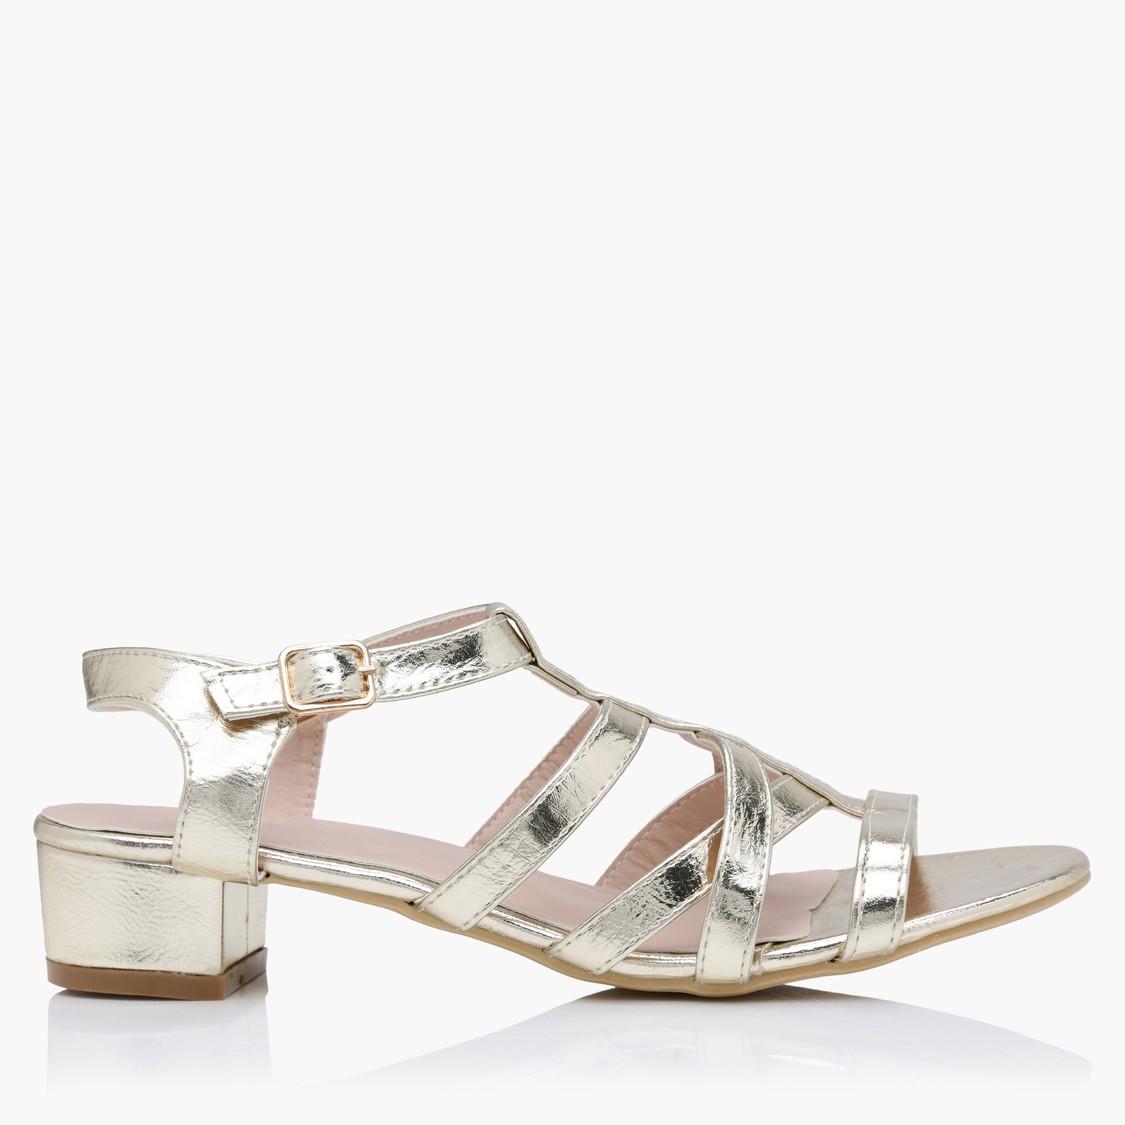 Multi Strap Block Heel Sandals with Buckle Closure